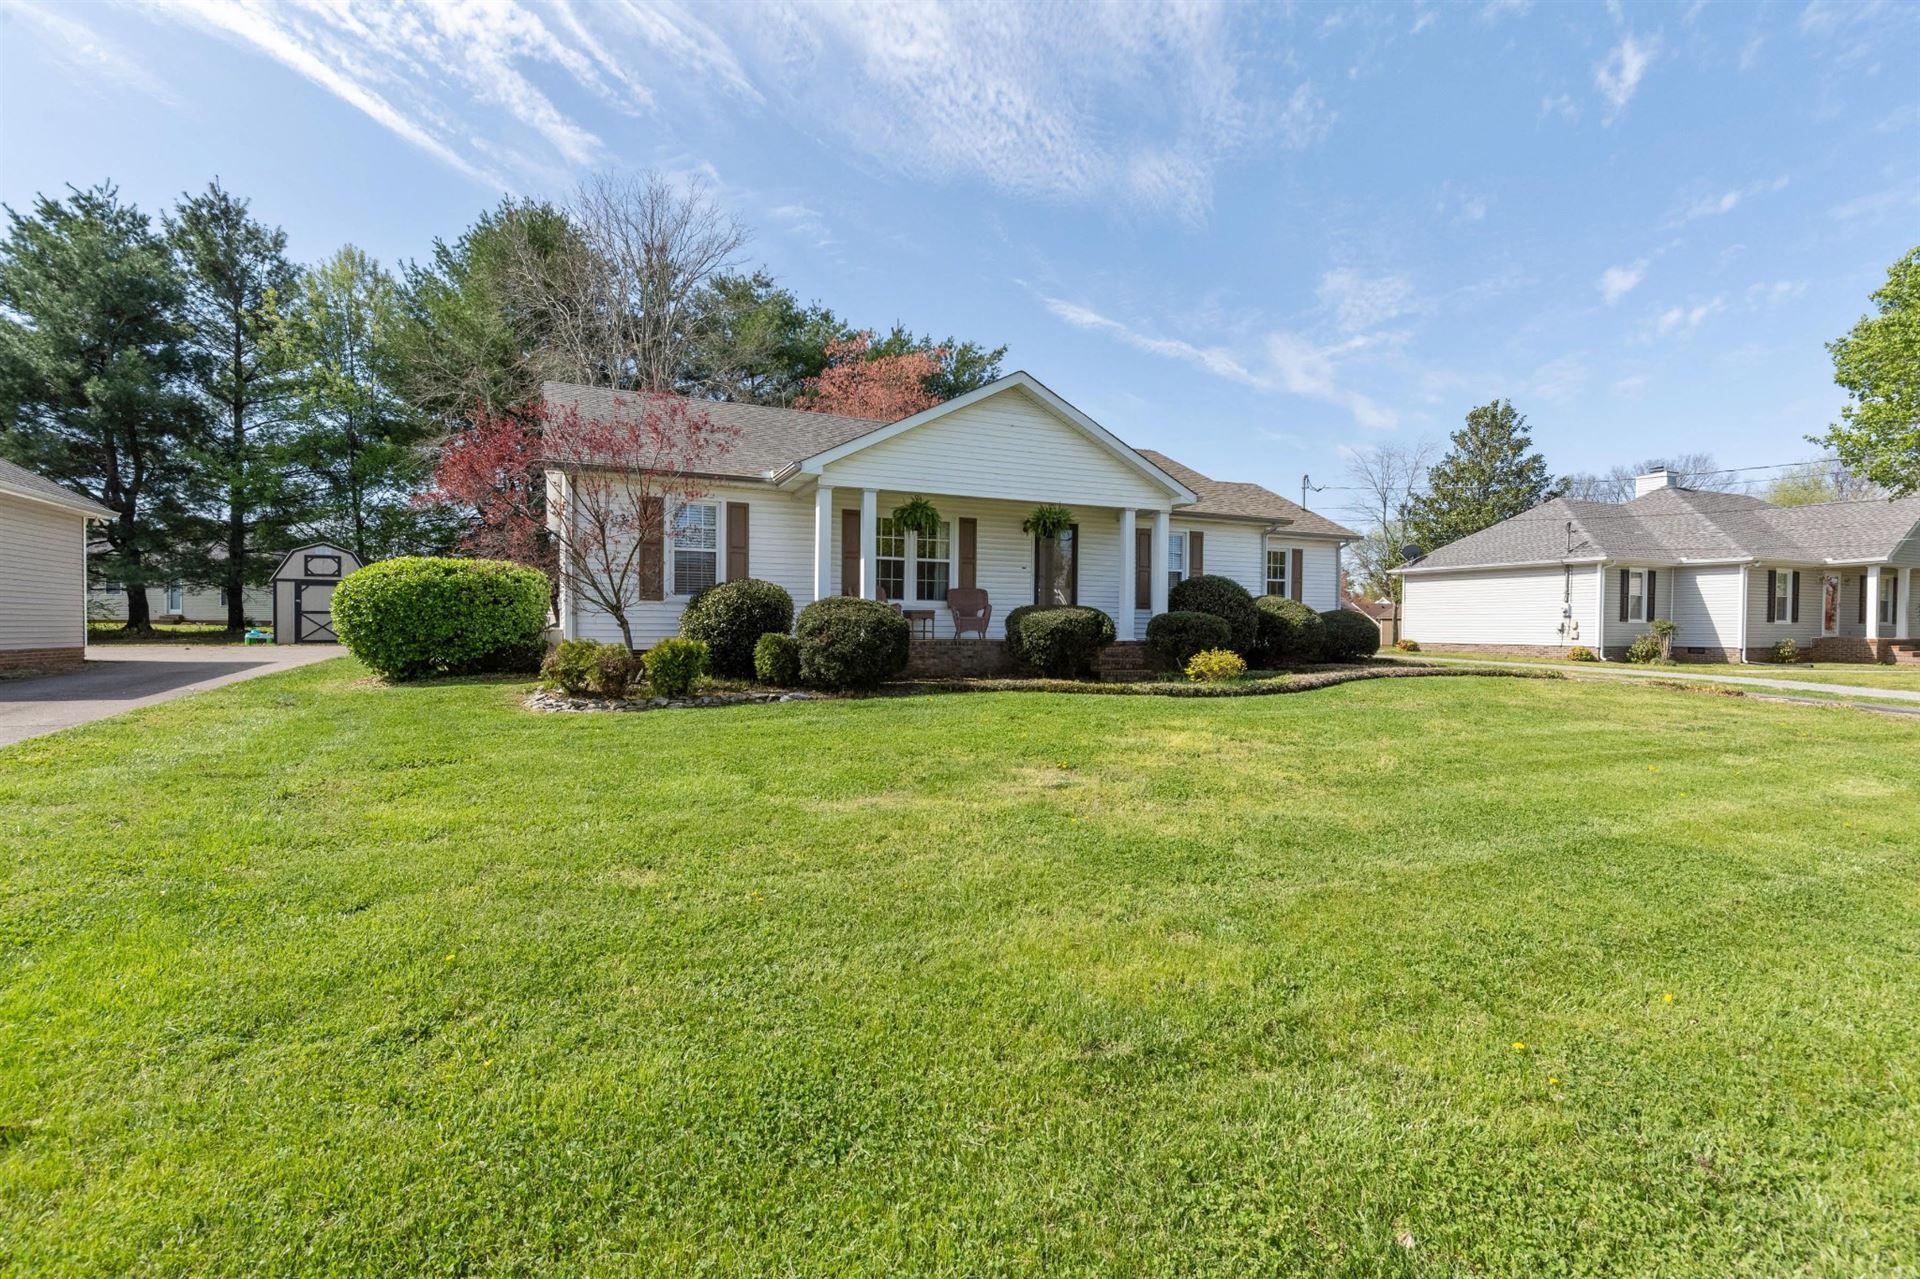 Photo of 2313 Briar Bend Dr, Murfreesboro, TN 37128 (MLS # 2244143)